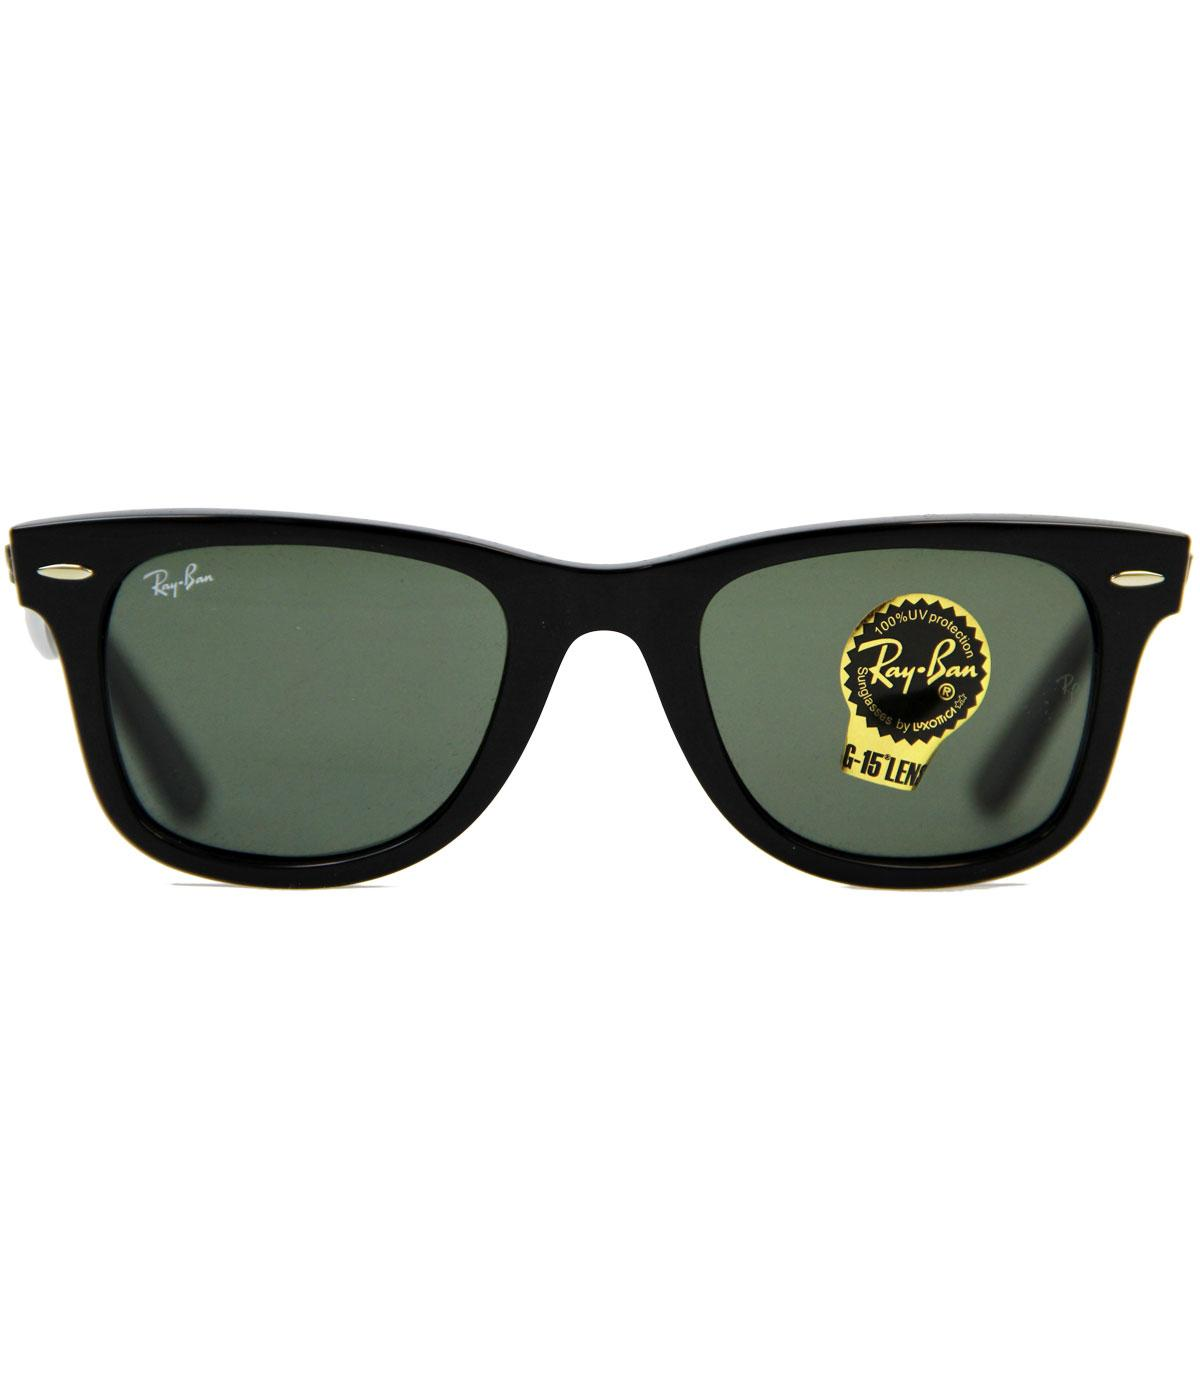 Ray-Ban Retro Mod Wayfarer Indie Sunglasses (Bl)